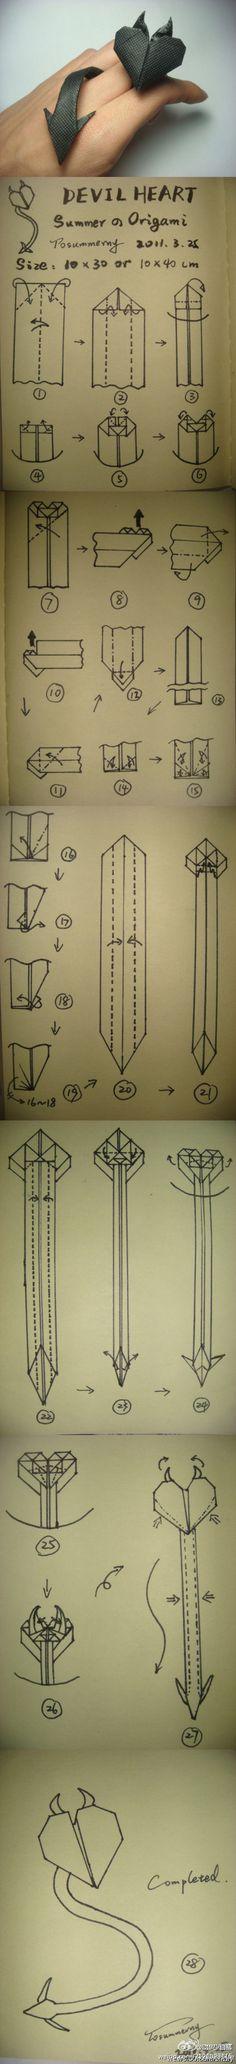 Origami devilheart... So cool